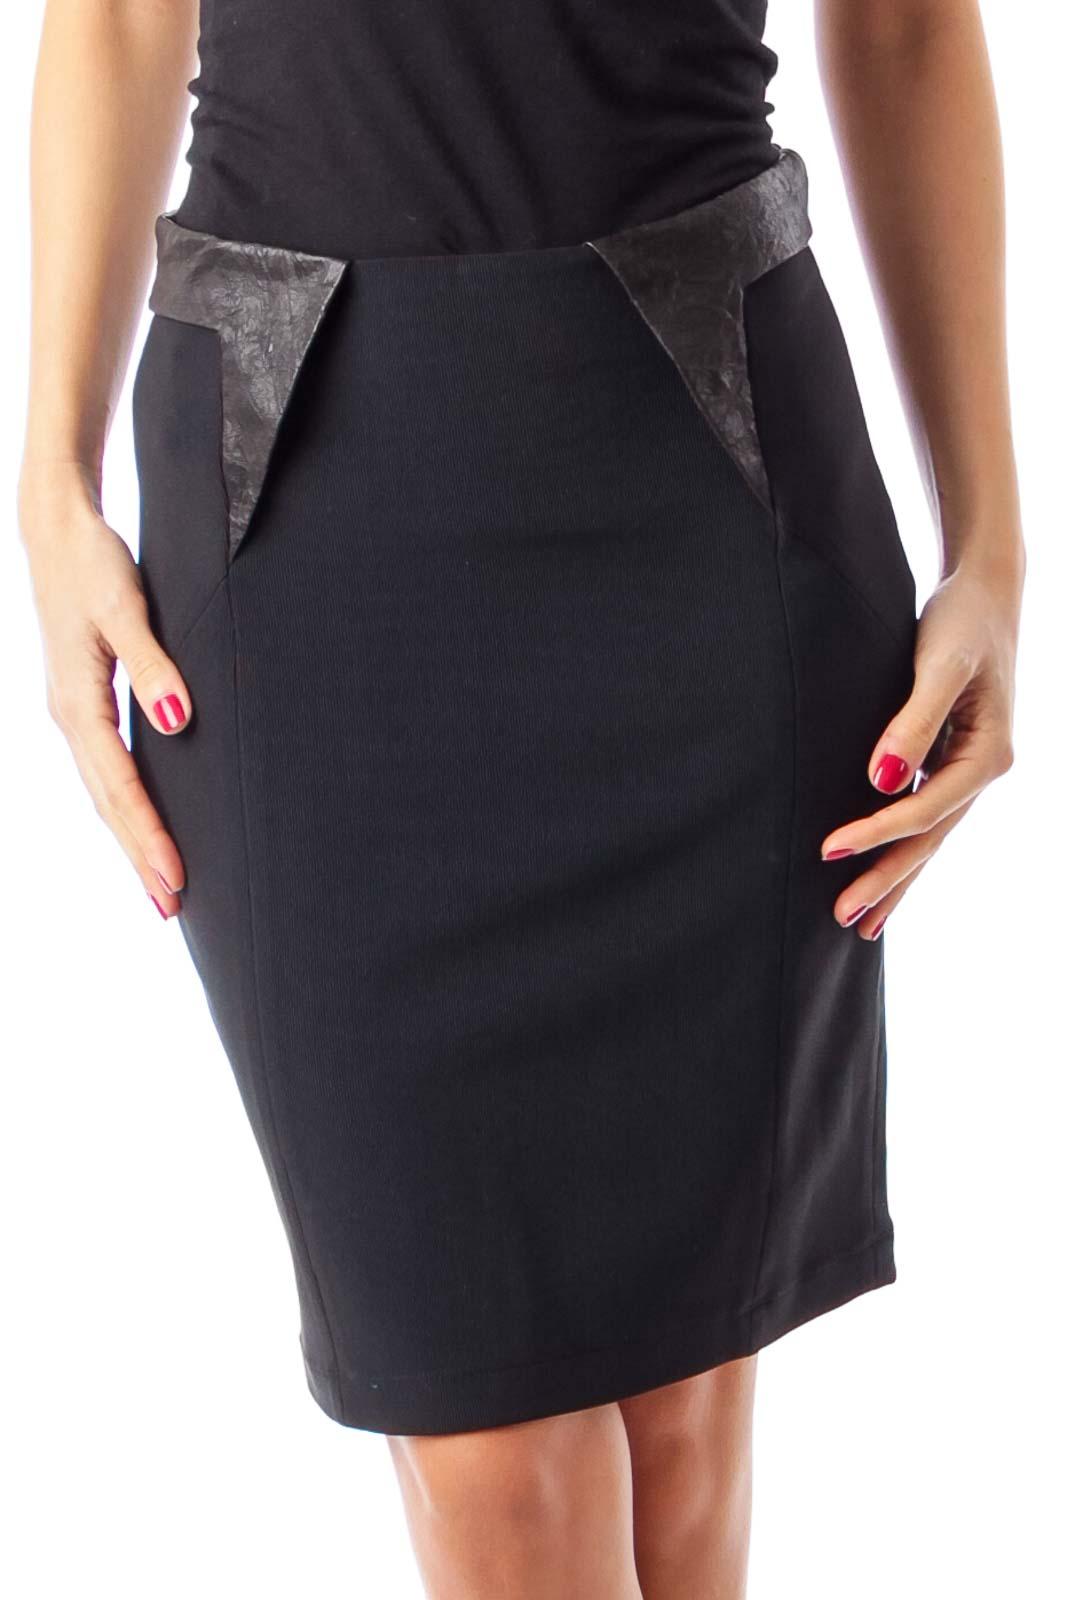 Black Leather Trim Pencil Skirt Front